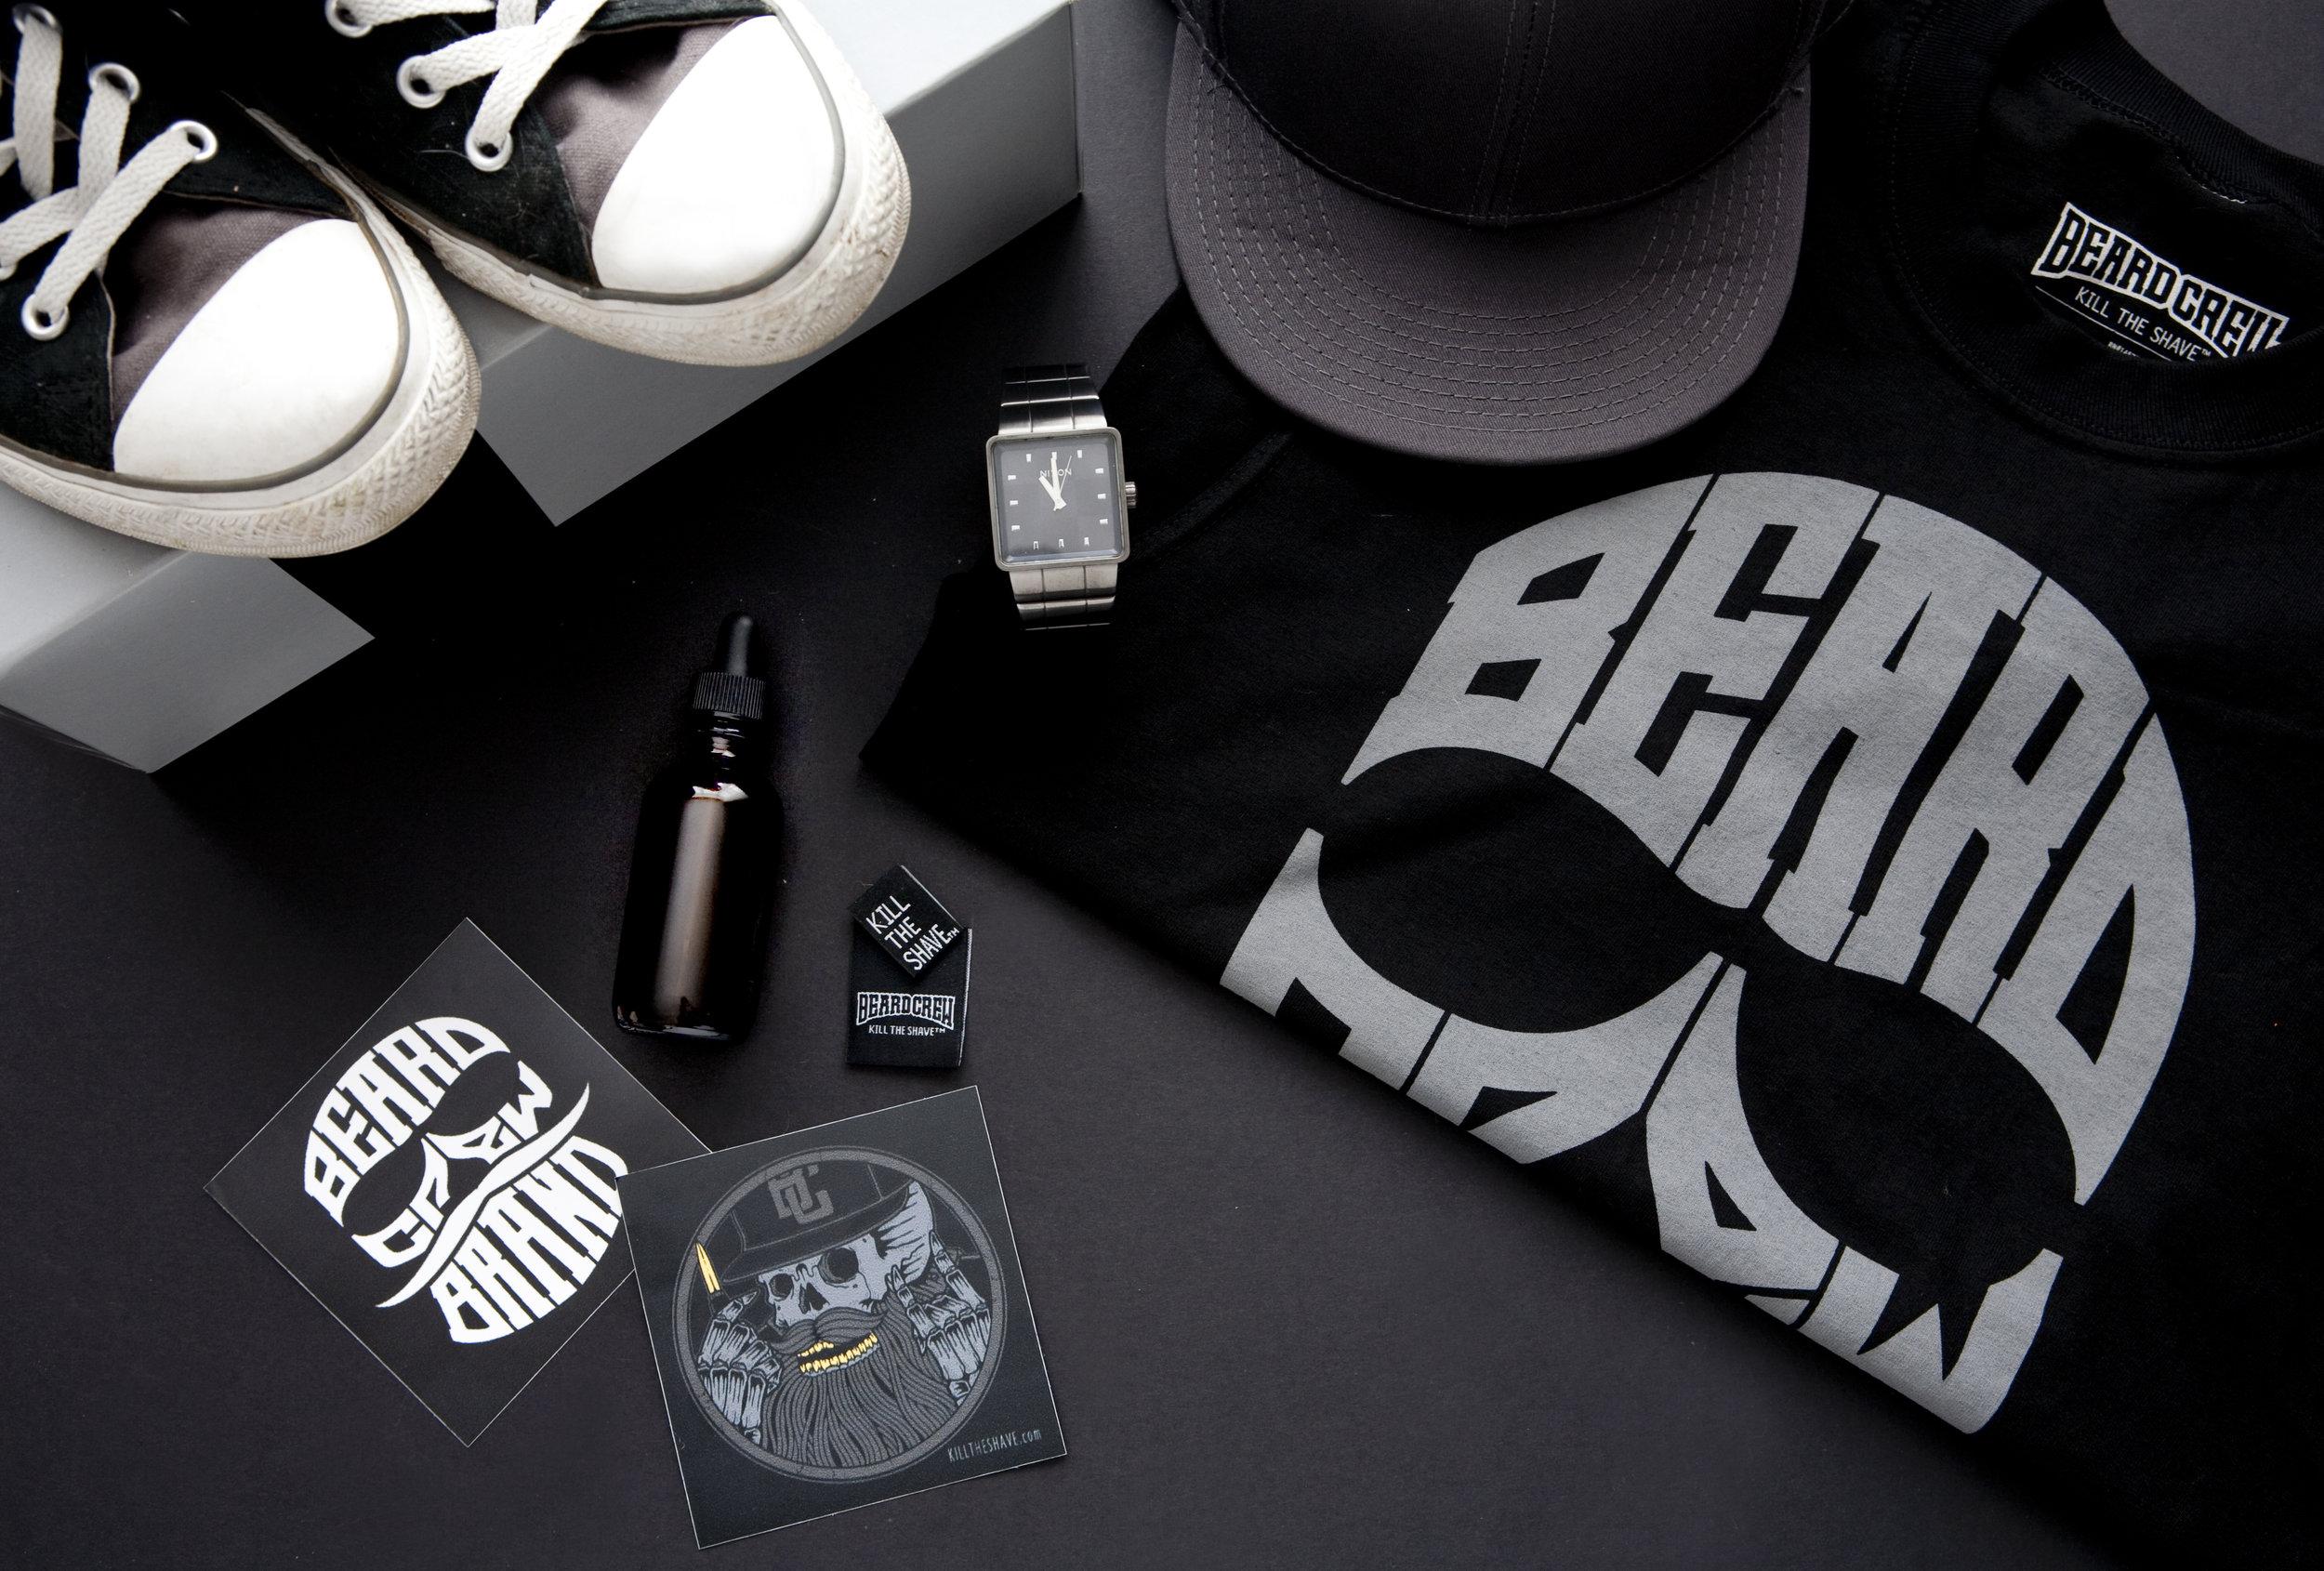 01_beardcrew_brand.jpg